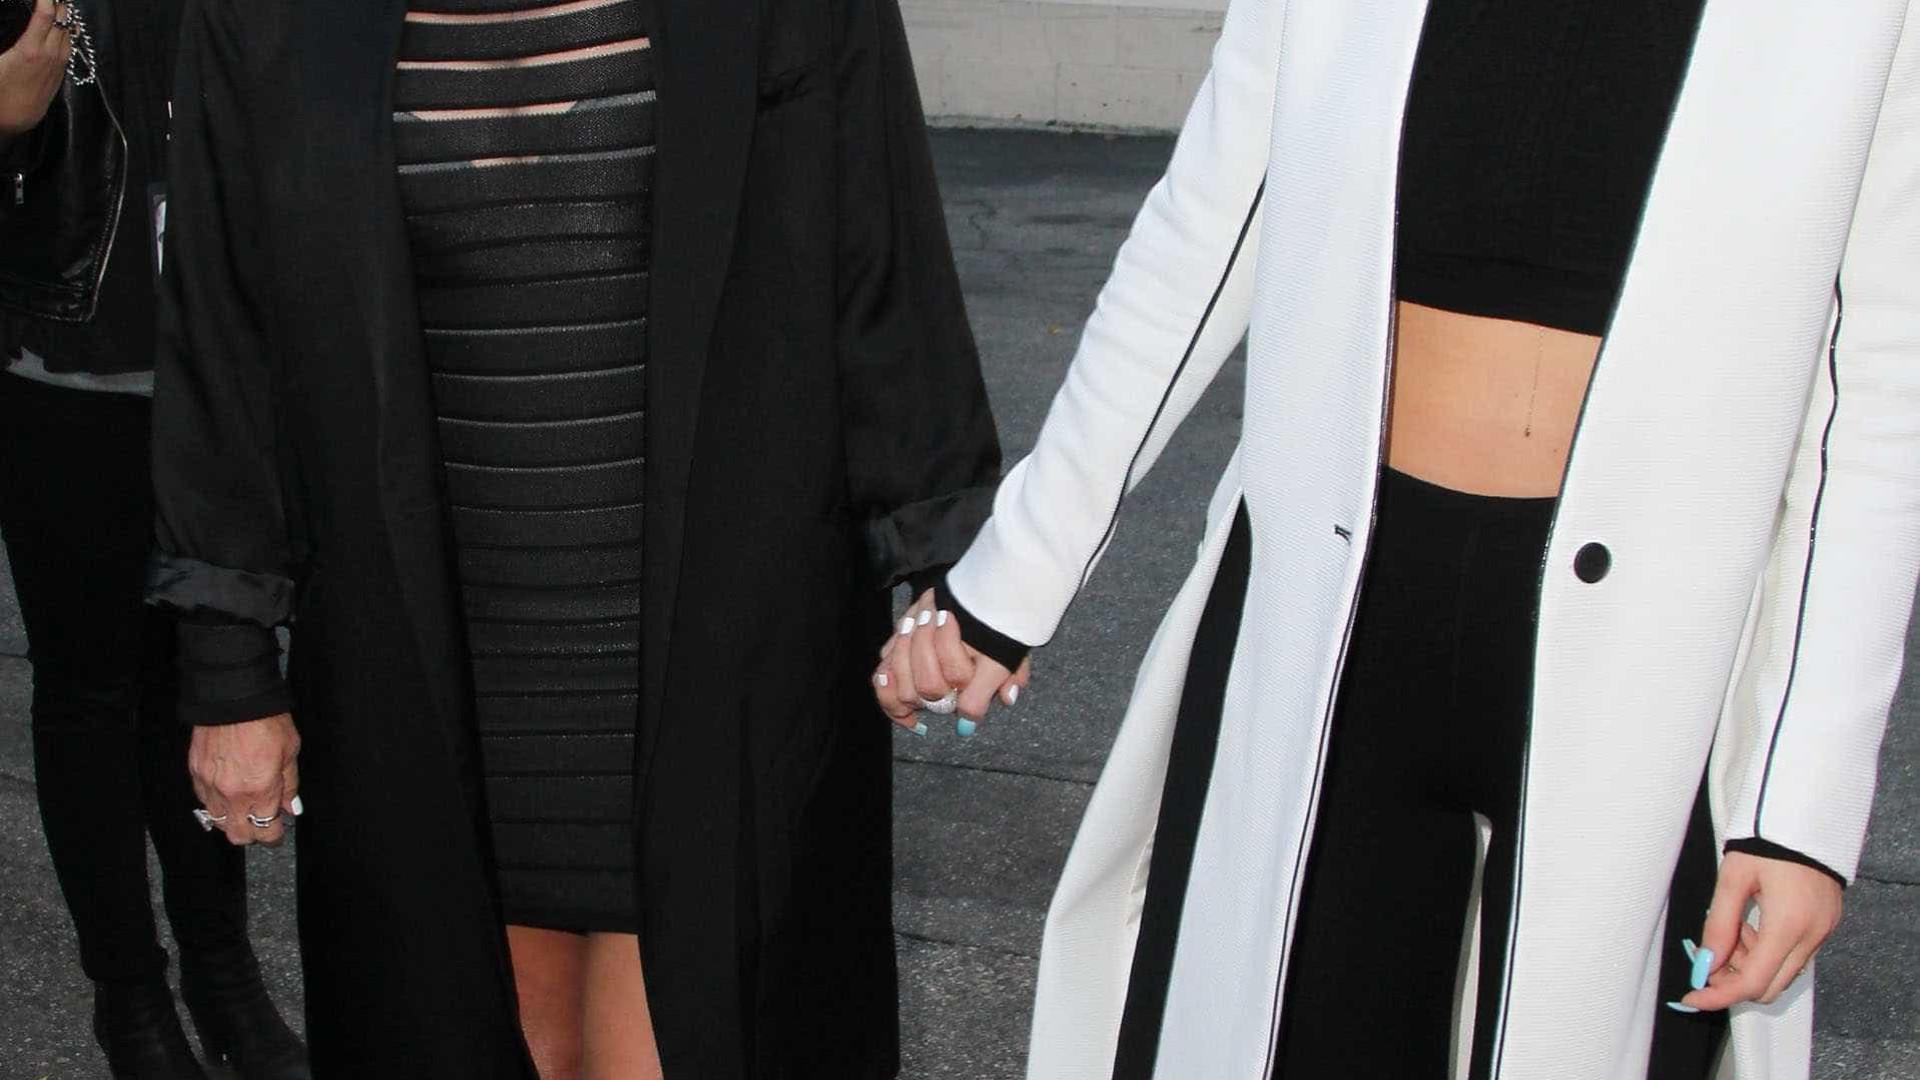 Kylie Jenner cortou o cabelo para ficar 'igual' à mãe?